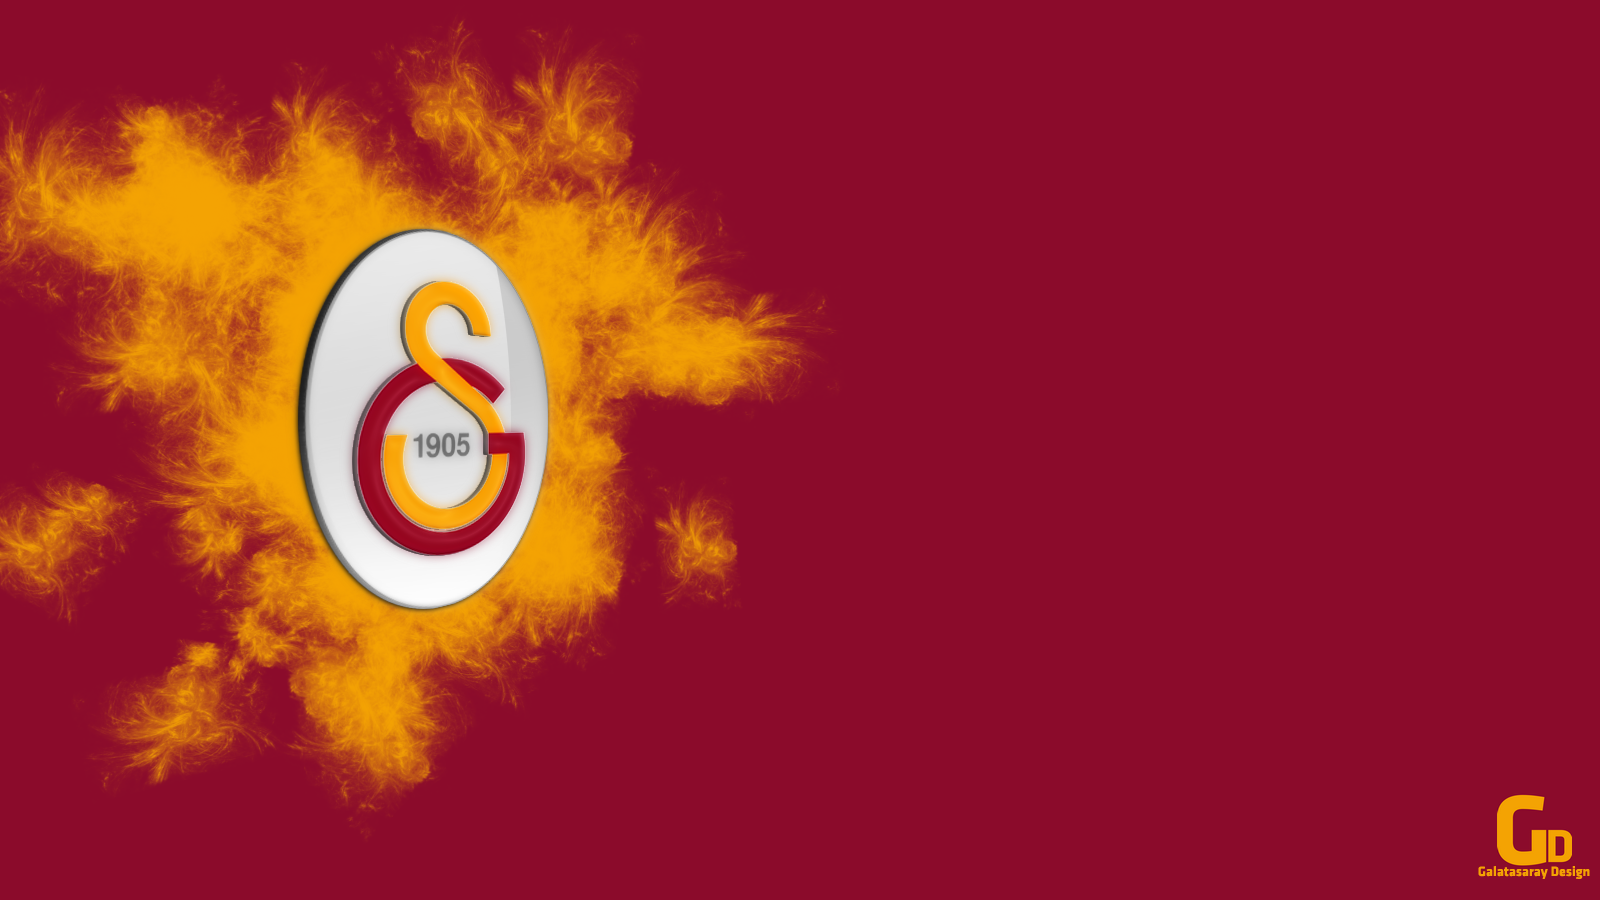 Galatasaray Logo Resimleri